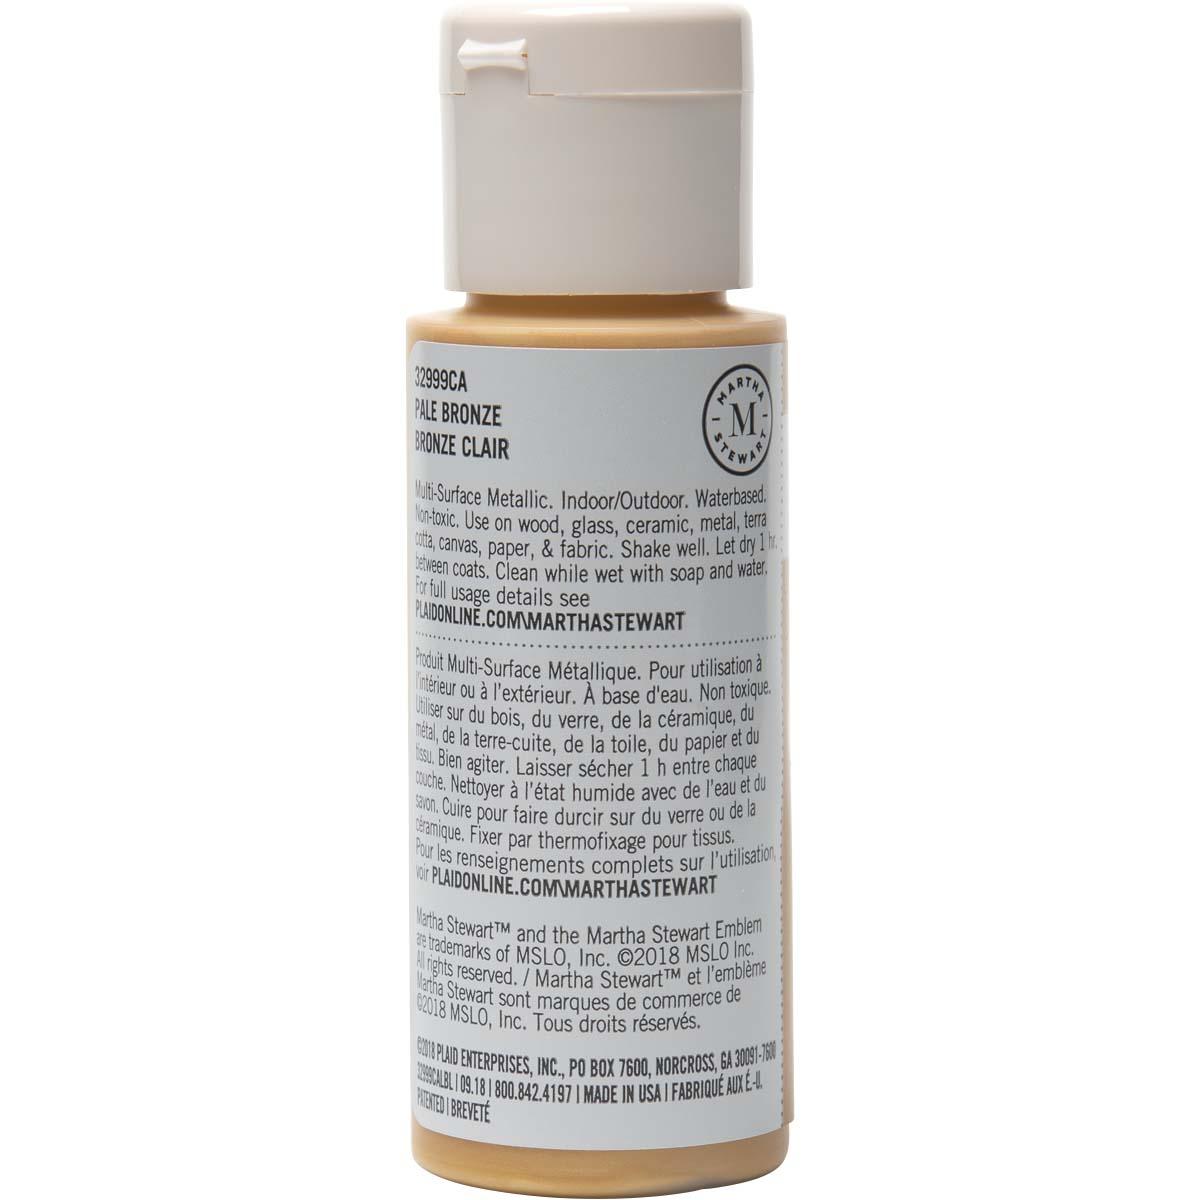 Martha Stewart ® Multi-Surface Metallic Acrylic Craft Paint - Pale Bronze, 2 oz. - 32999CA